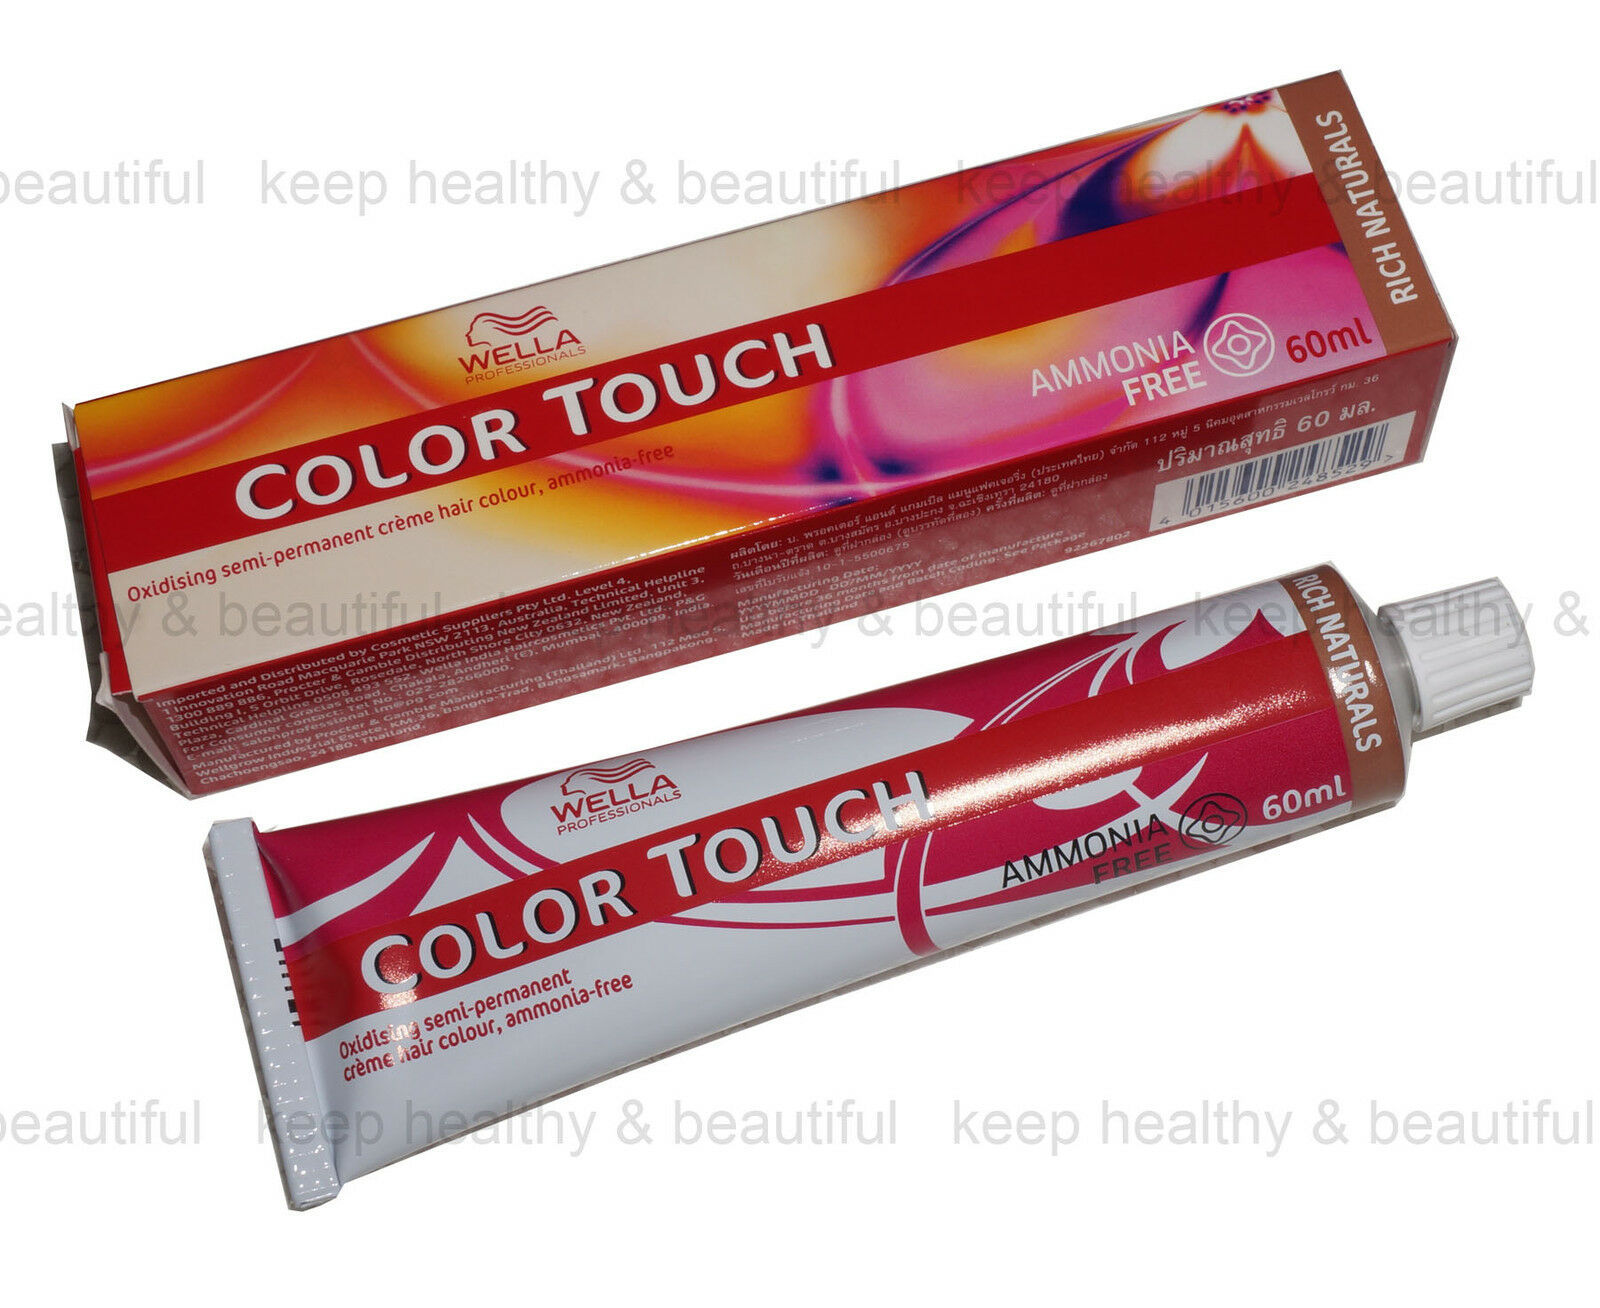 1x Wella Color Touch semi-permanent creme Hair Colour 60 ml  - $8.90